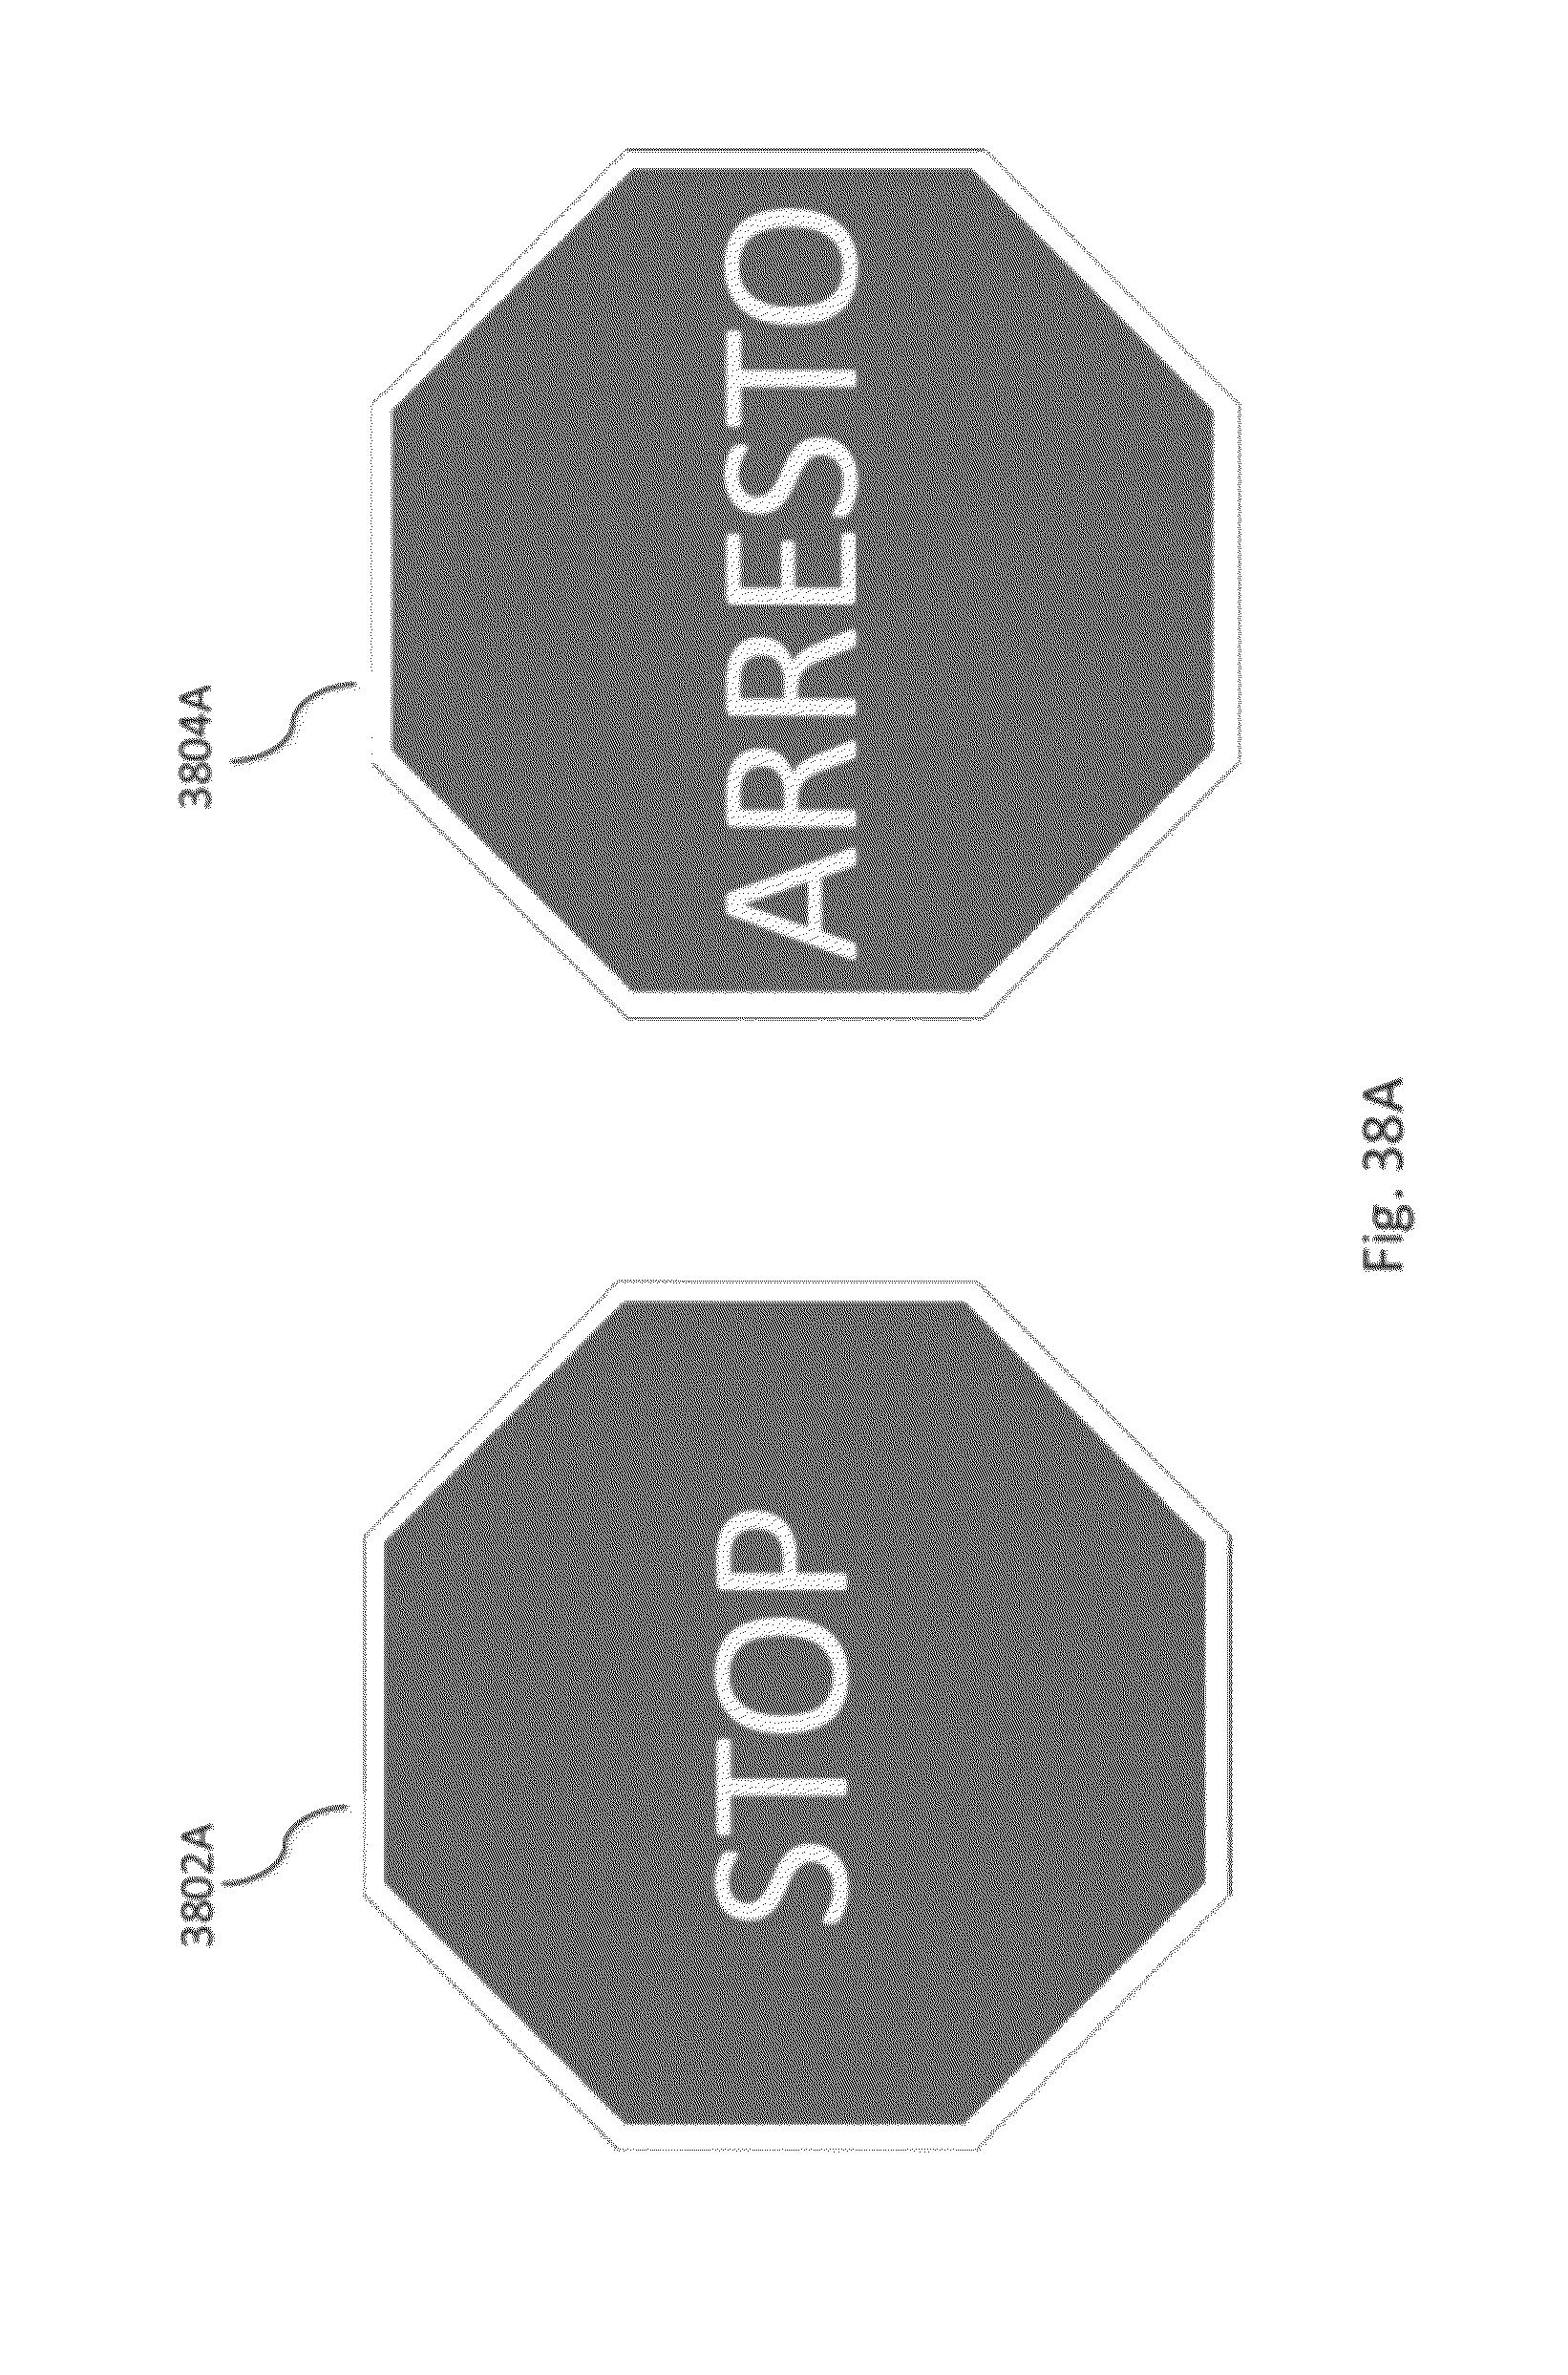 Patent Us 9182596 B2 Shop Vac Model 2010 Wiring Diagram Images